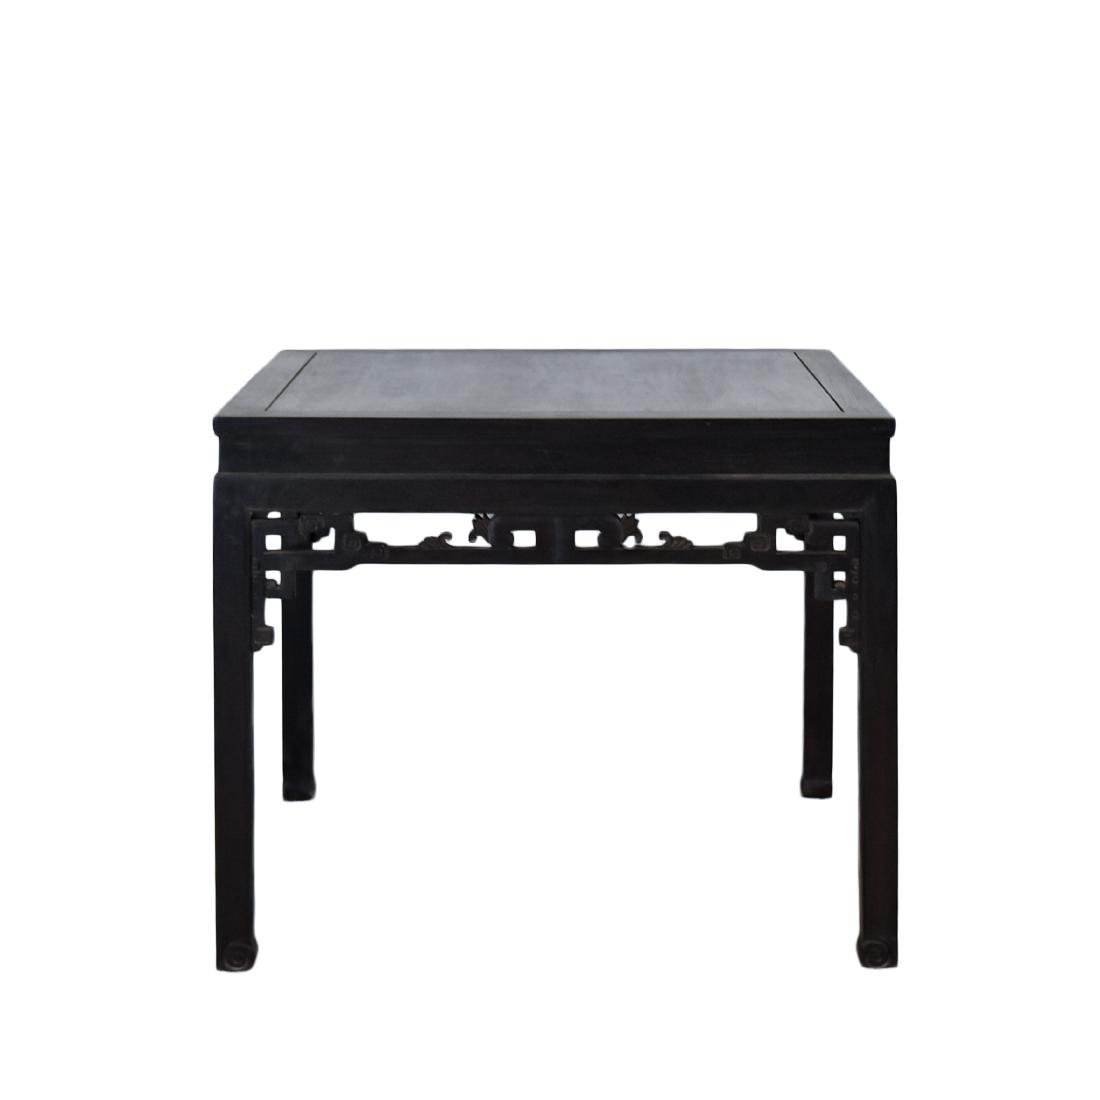 A ZITAN WAISTED SQUARE CORNER-LEG TABLE, FANGZHUO